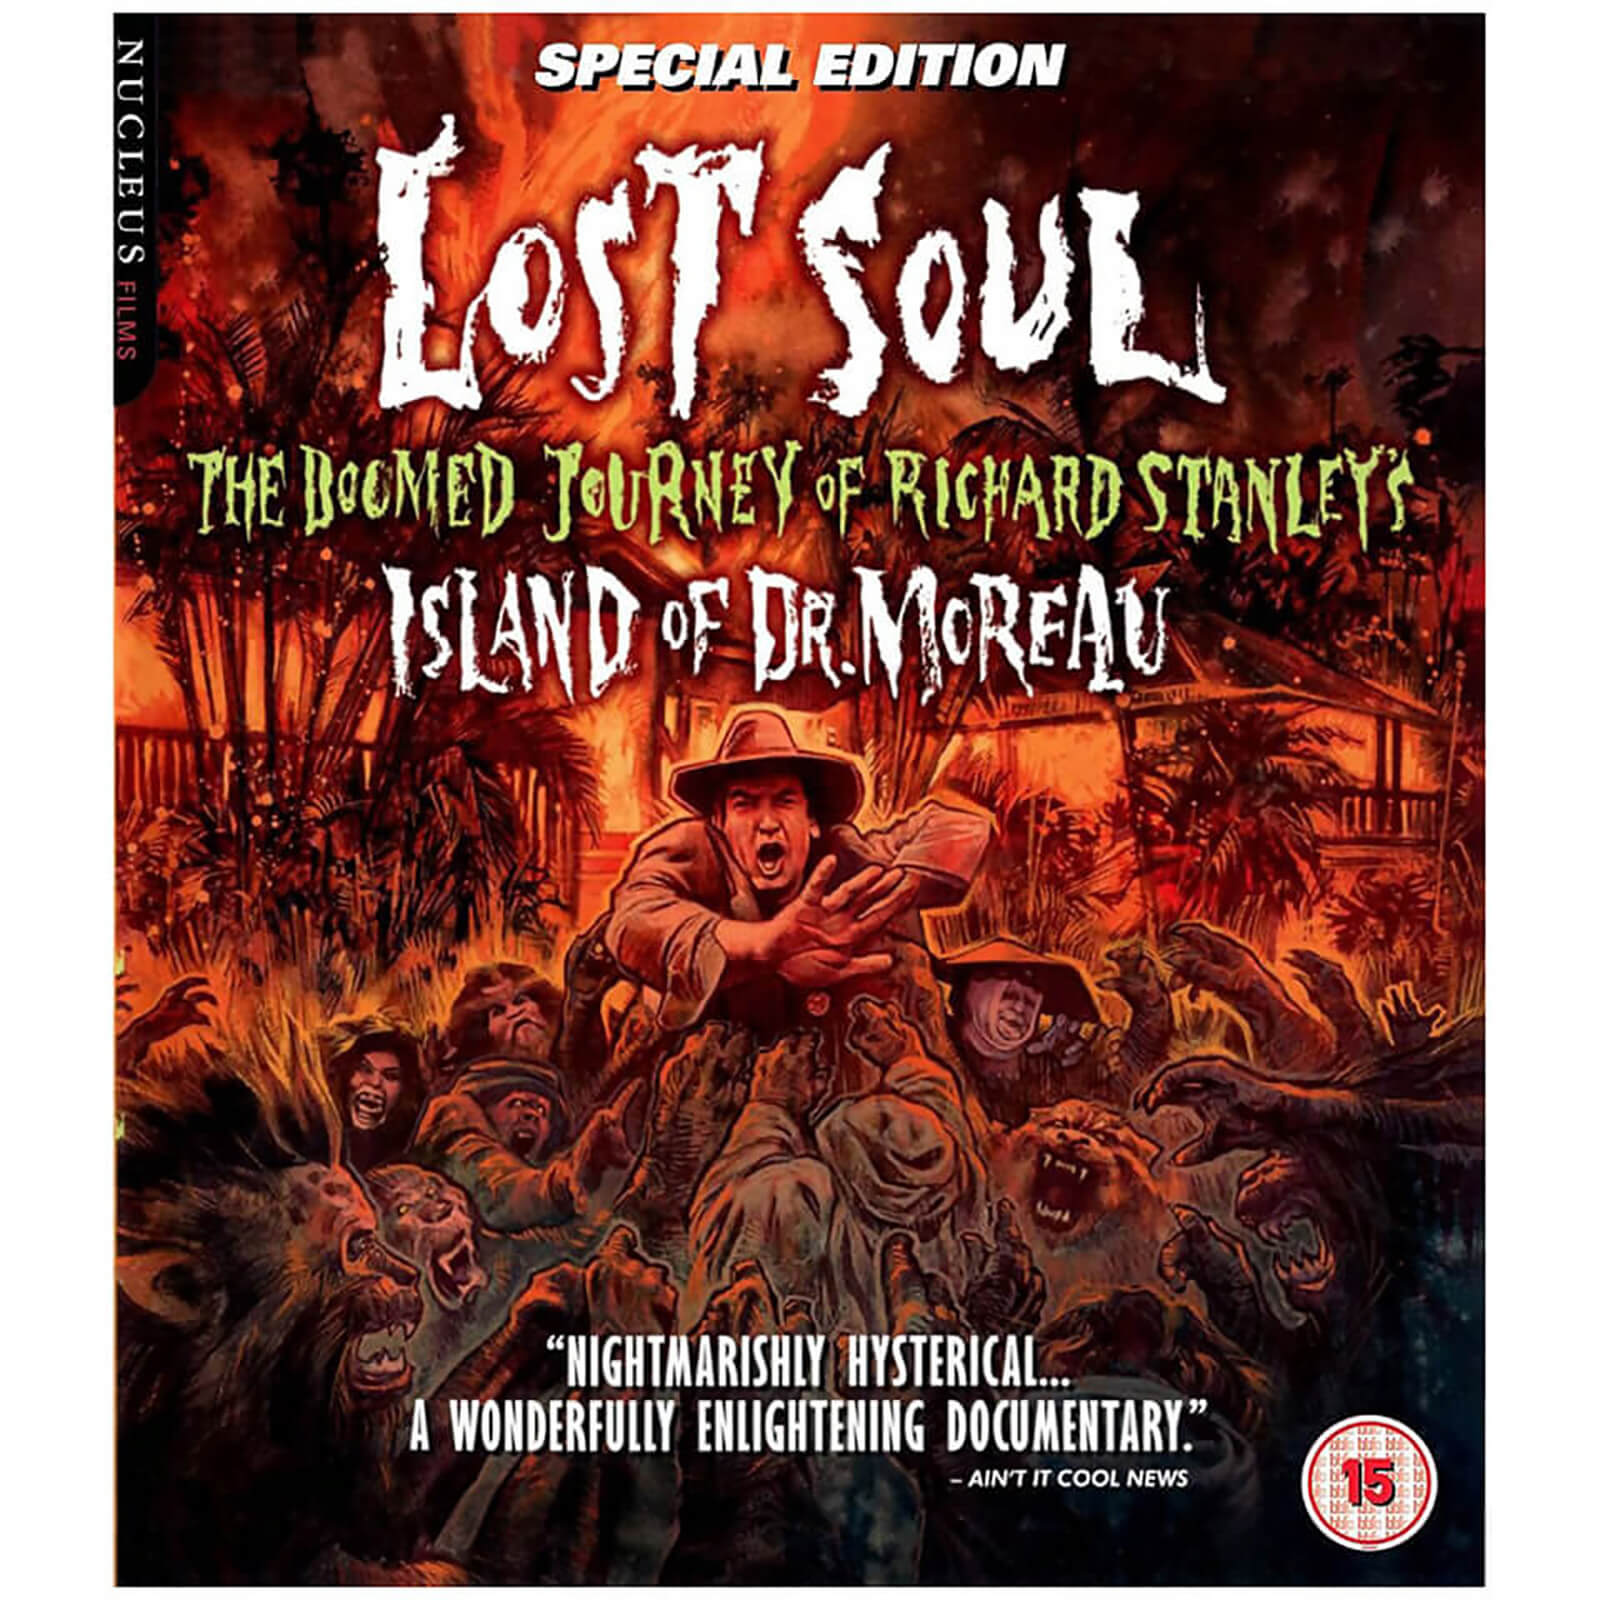 Lost Soul - The Doomed Journey of Richard Stanley's Island of Dr. Moreau